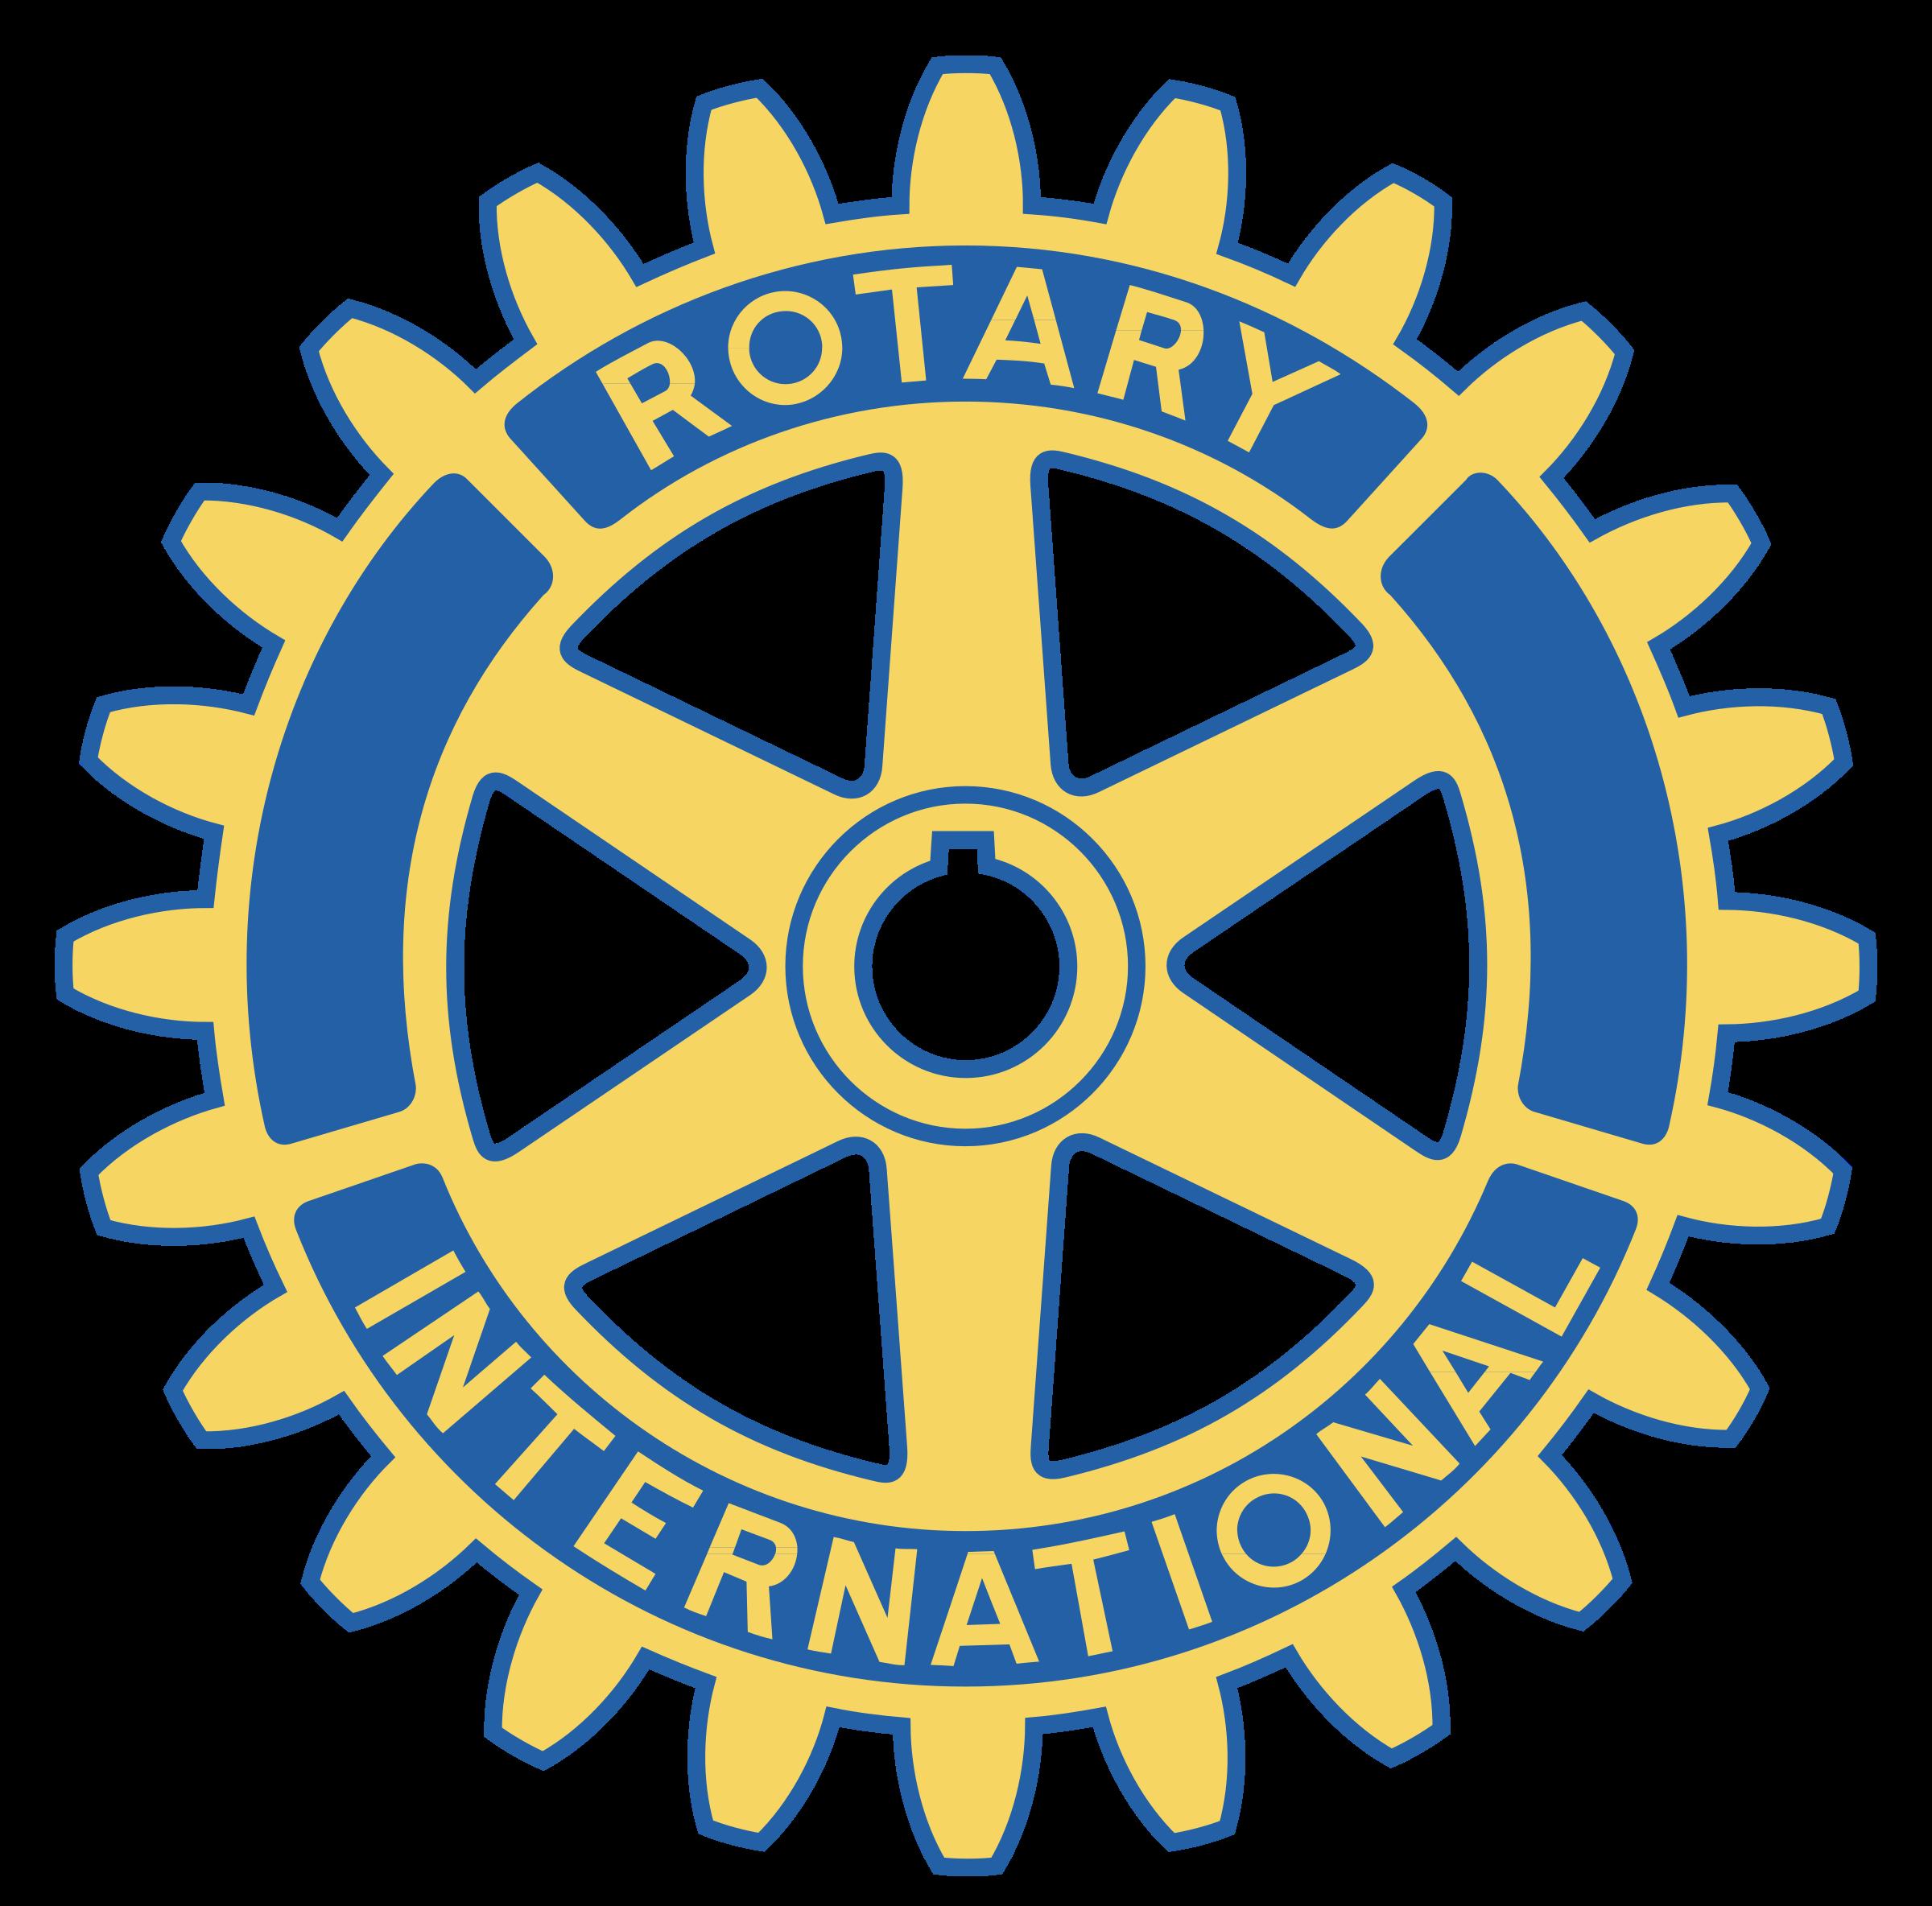 Churchill-Wilkins Rotary Club